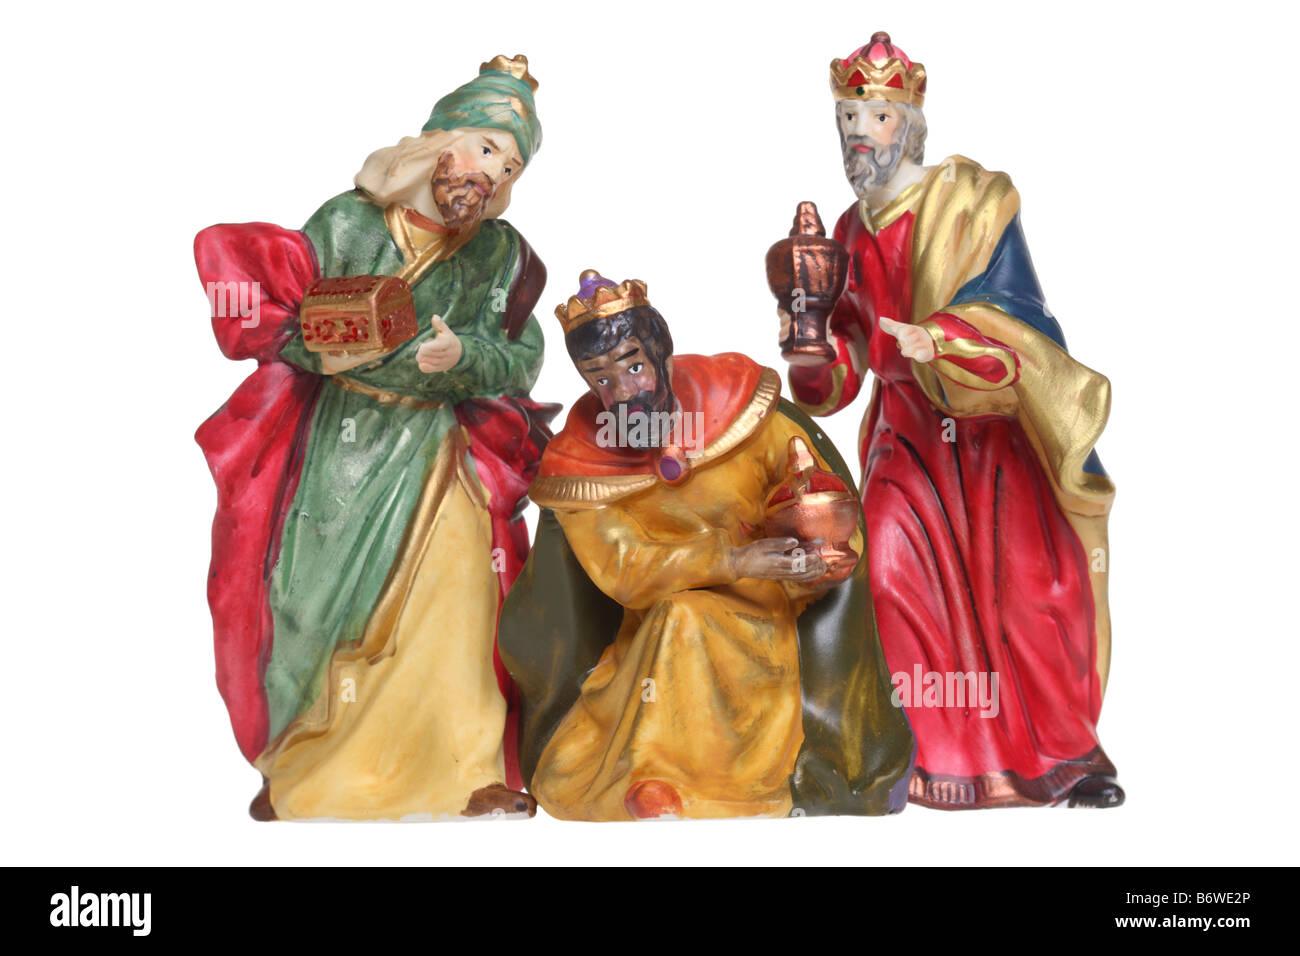 Childs White Magi Wise Man Religious Biblical Christmas Costume